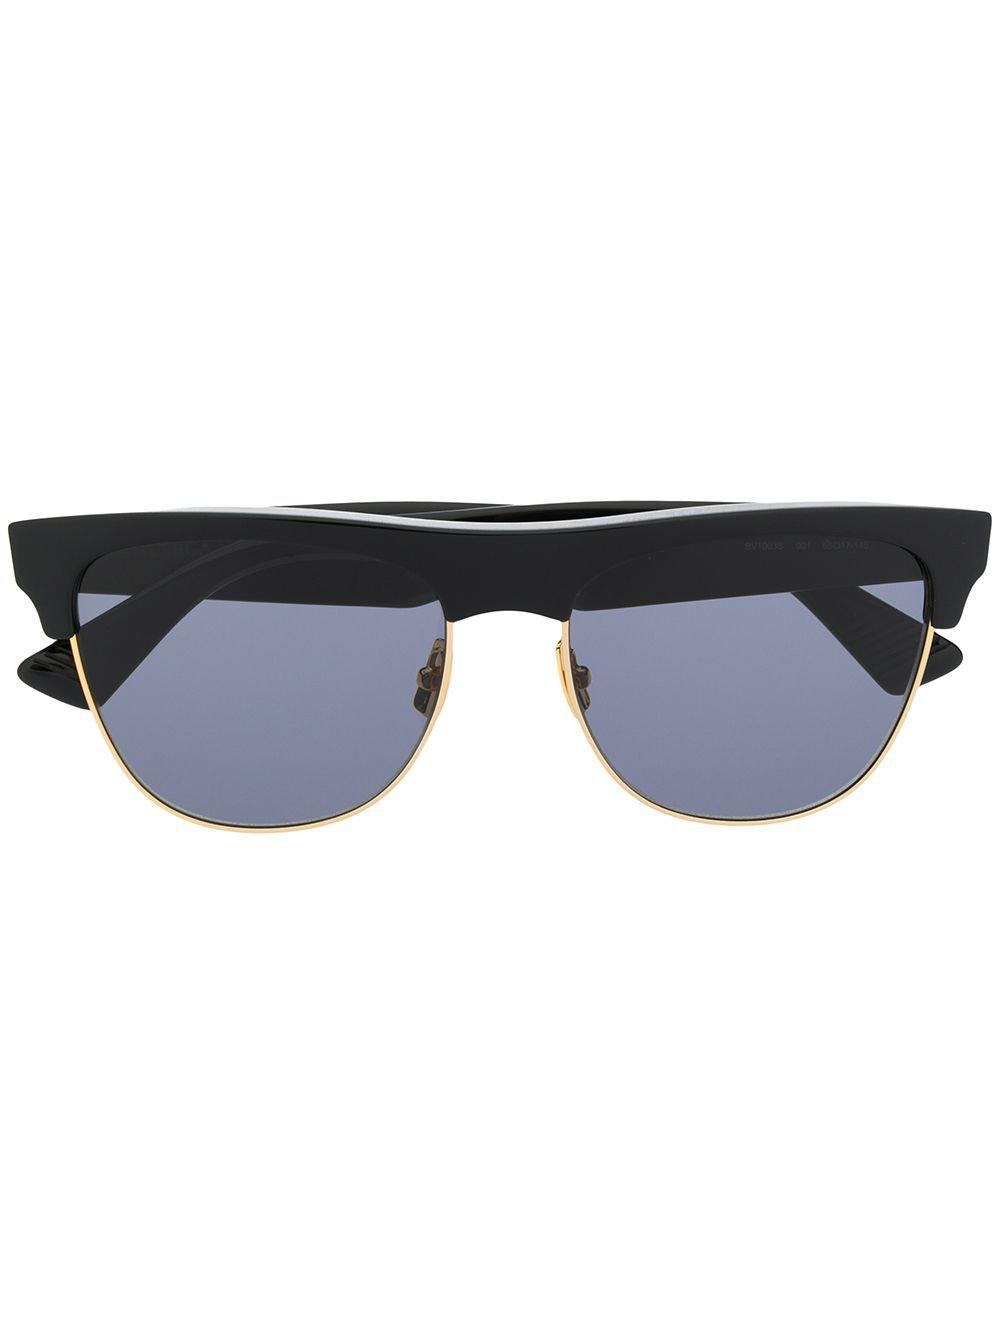 Bottega Veneta Eyewear Round Frame Sunglasses - Farfetch